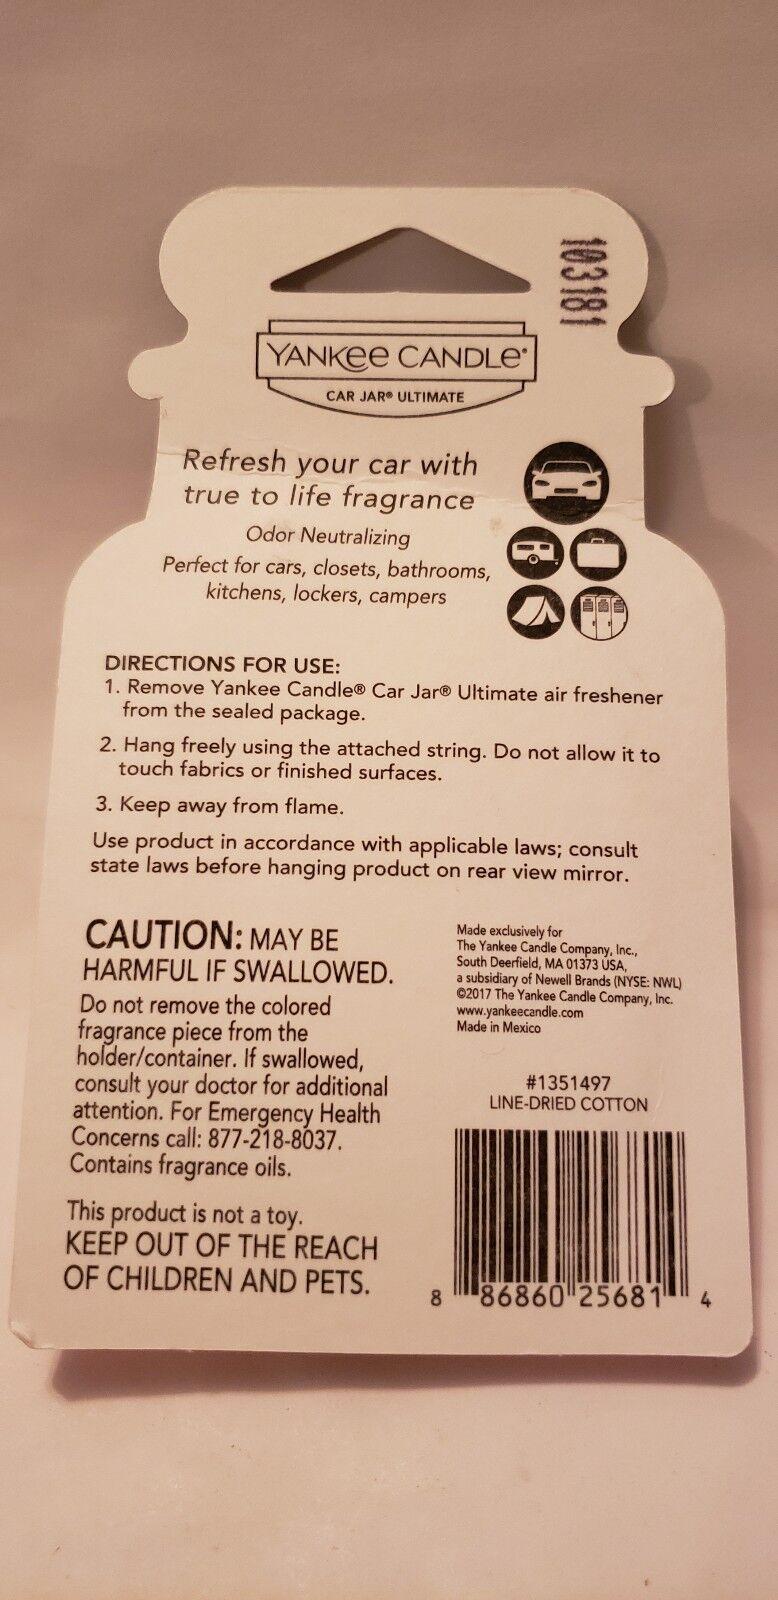 Yankee Candle USA Line Dried Cotton Car Jar